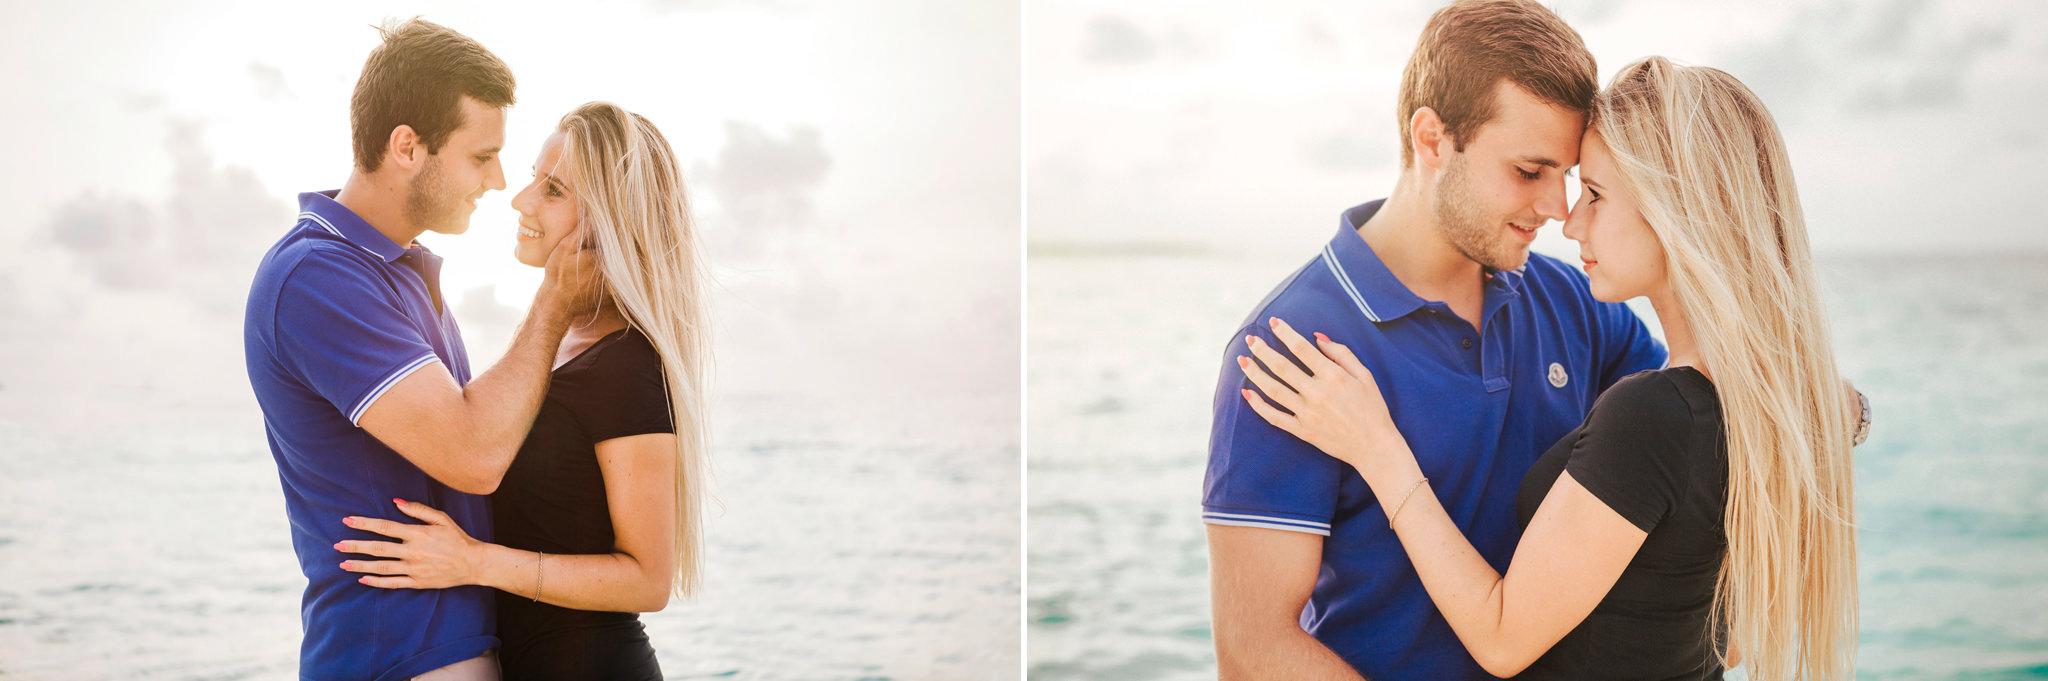 057-maldives-elopement-photographer.jpg